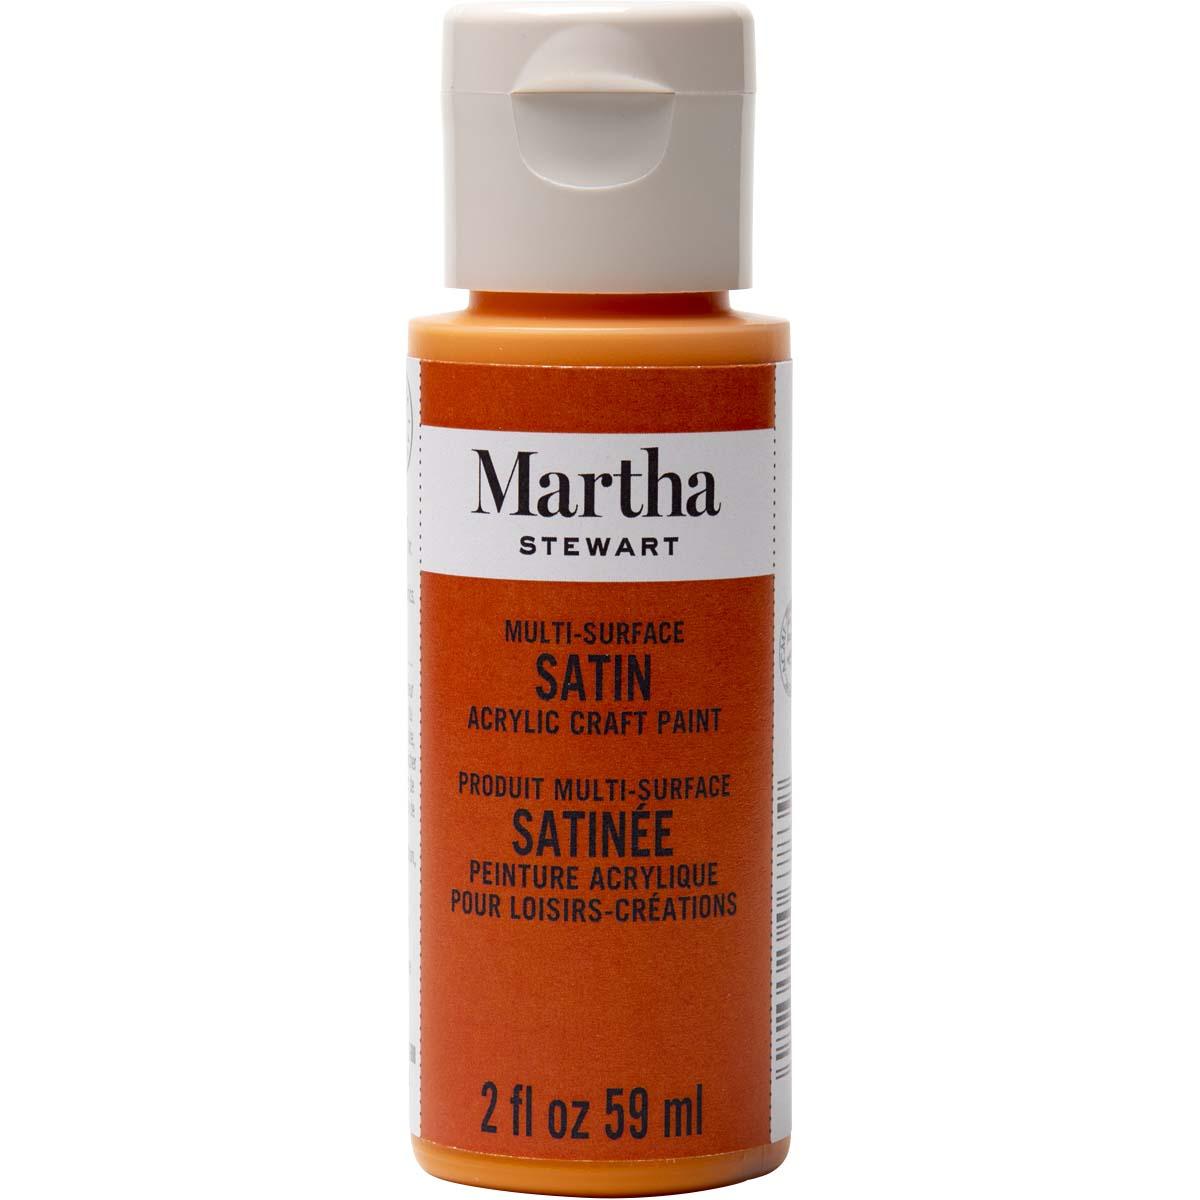 Martha Stewart ® Multi-Surface Satin Acrylic Craft Paint - Marmalade, 2 oz. - 32058CA